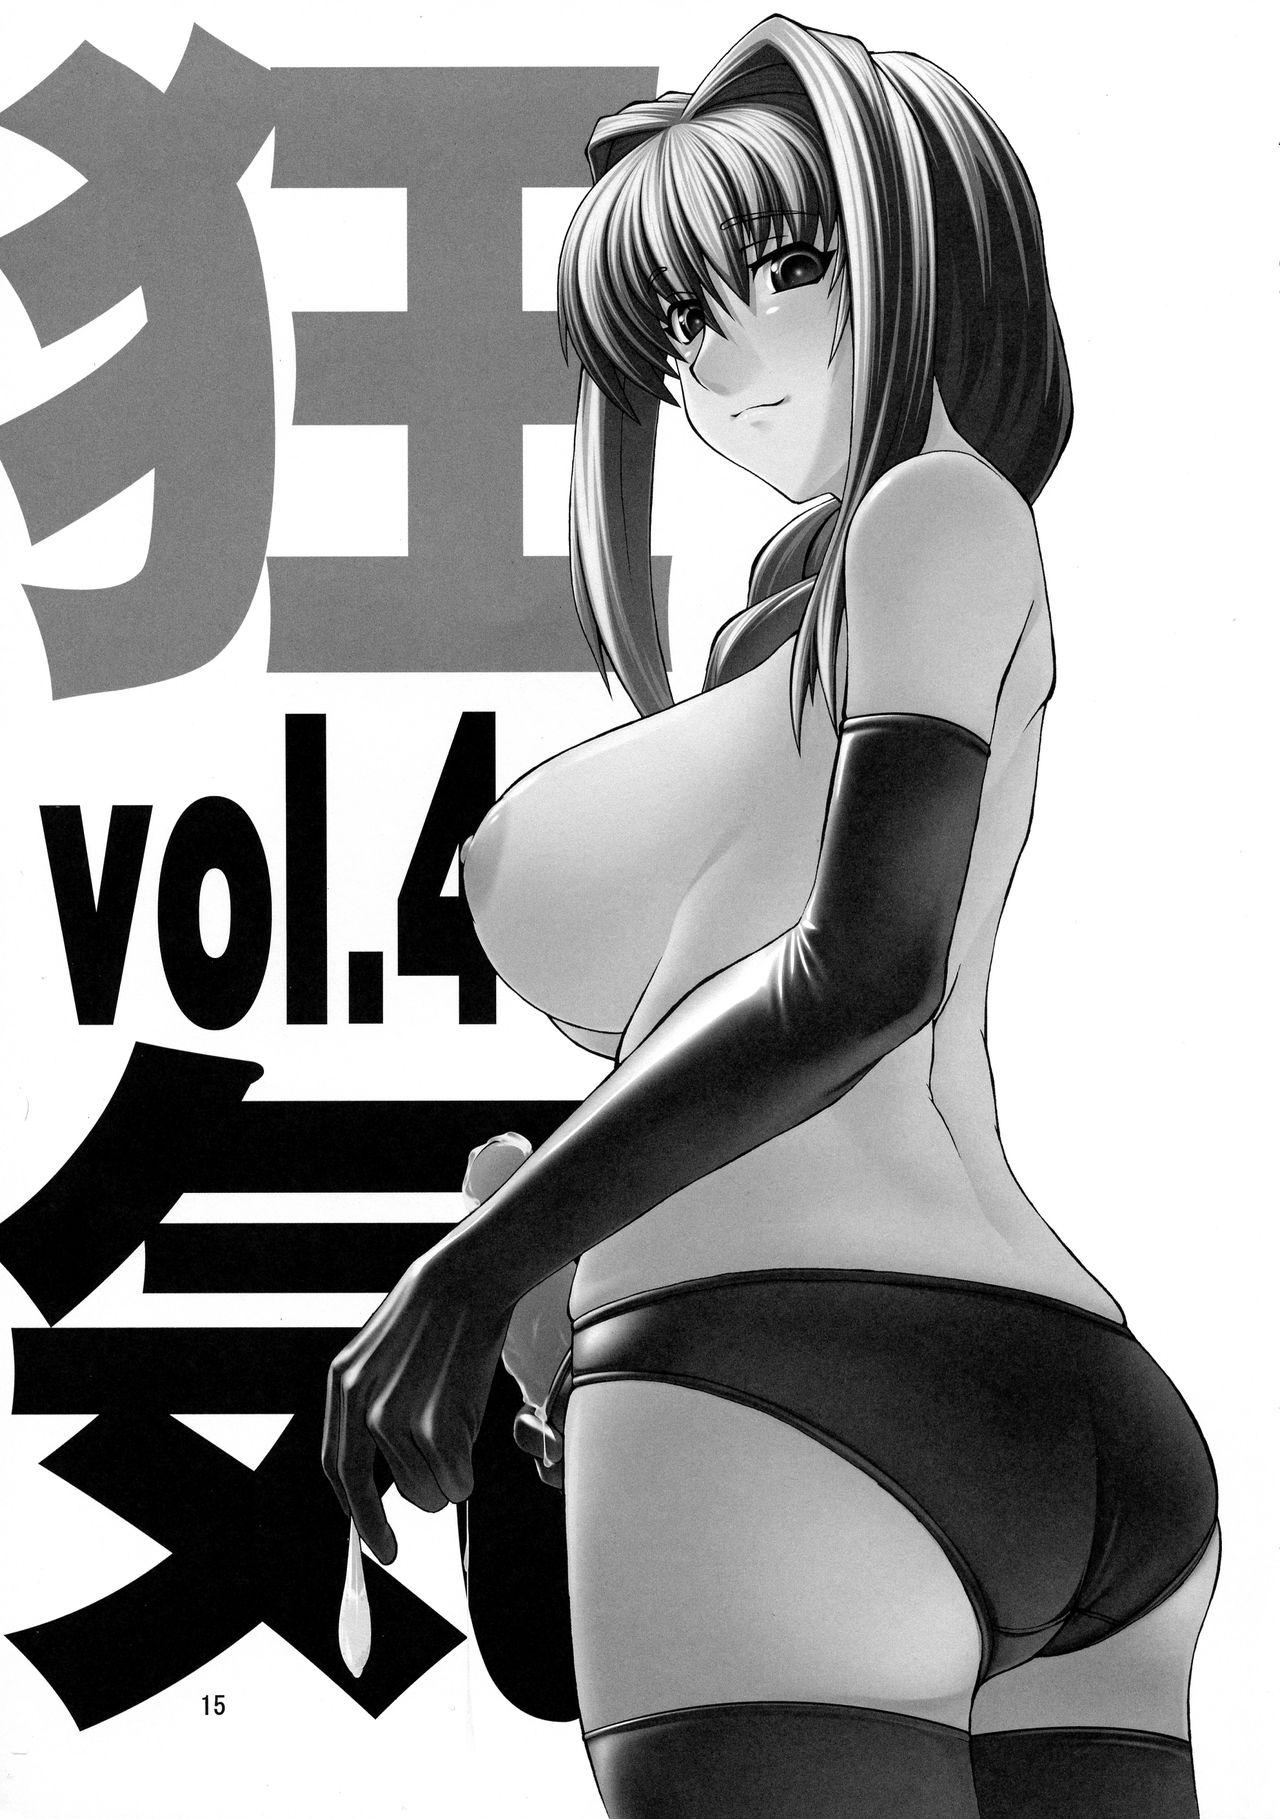 Kyouki Vol. 3~5 Remake Ver. 14